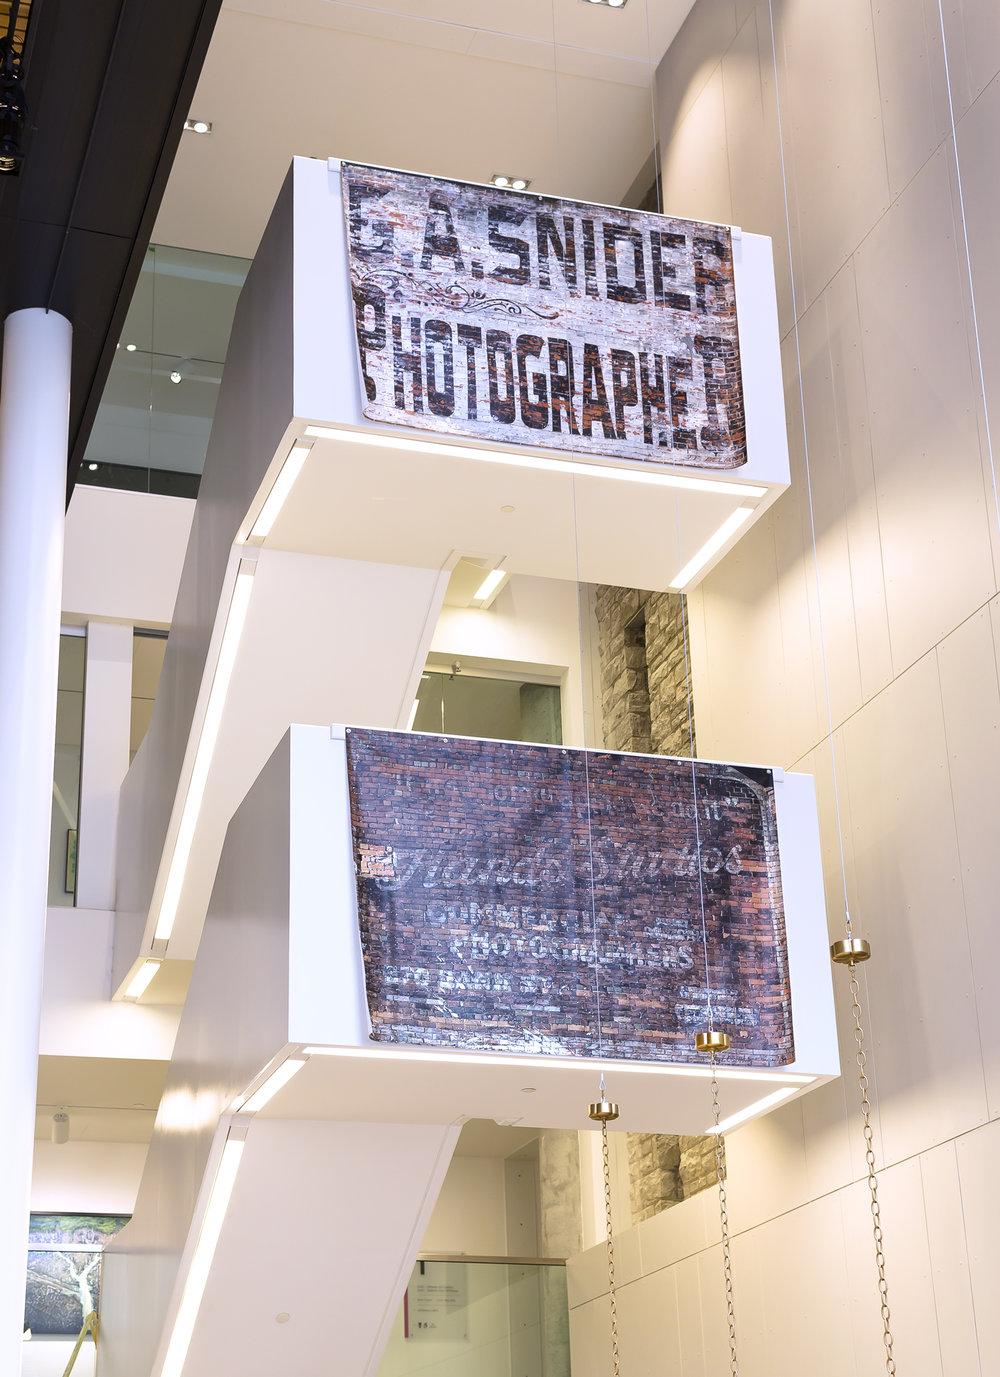 CommercialPhotographers.web.jpg